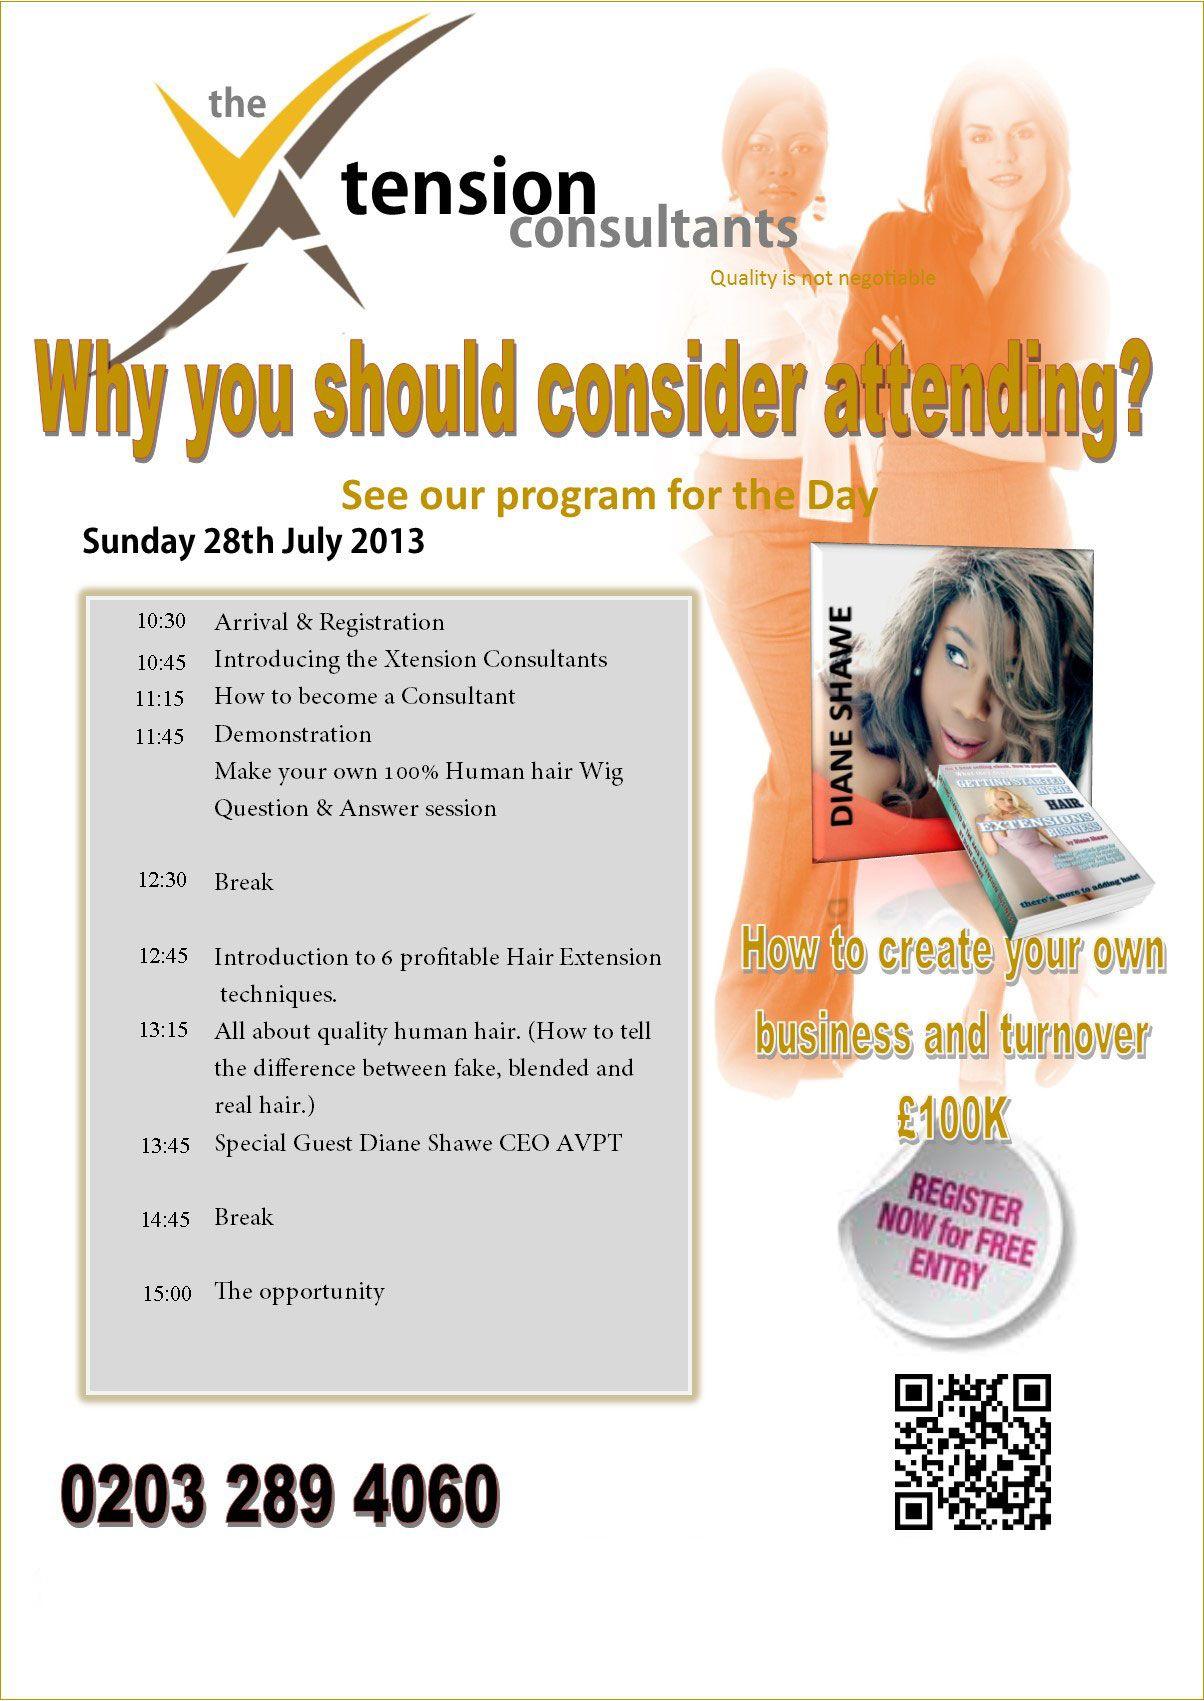 Agenda for careers in hair extensions event in birmingham